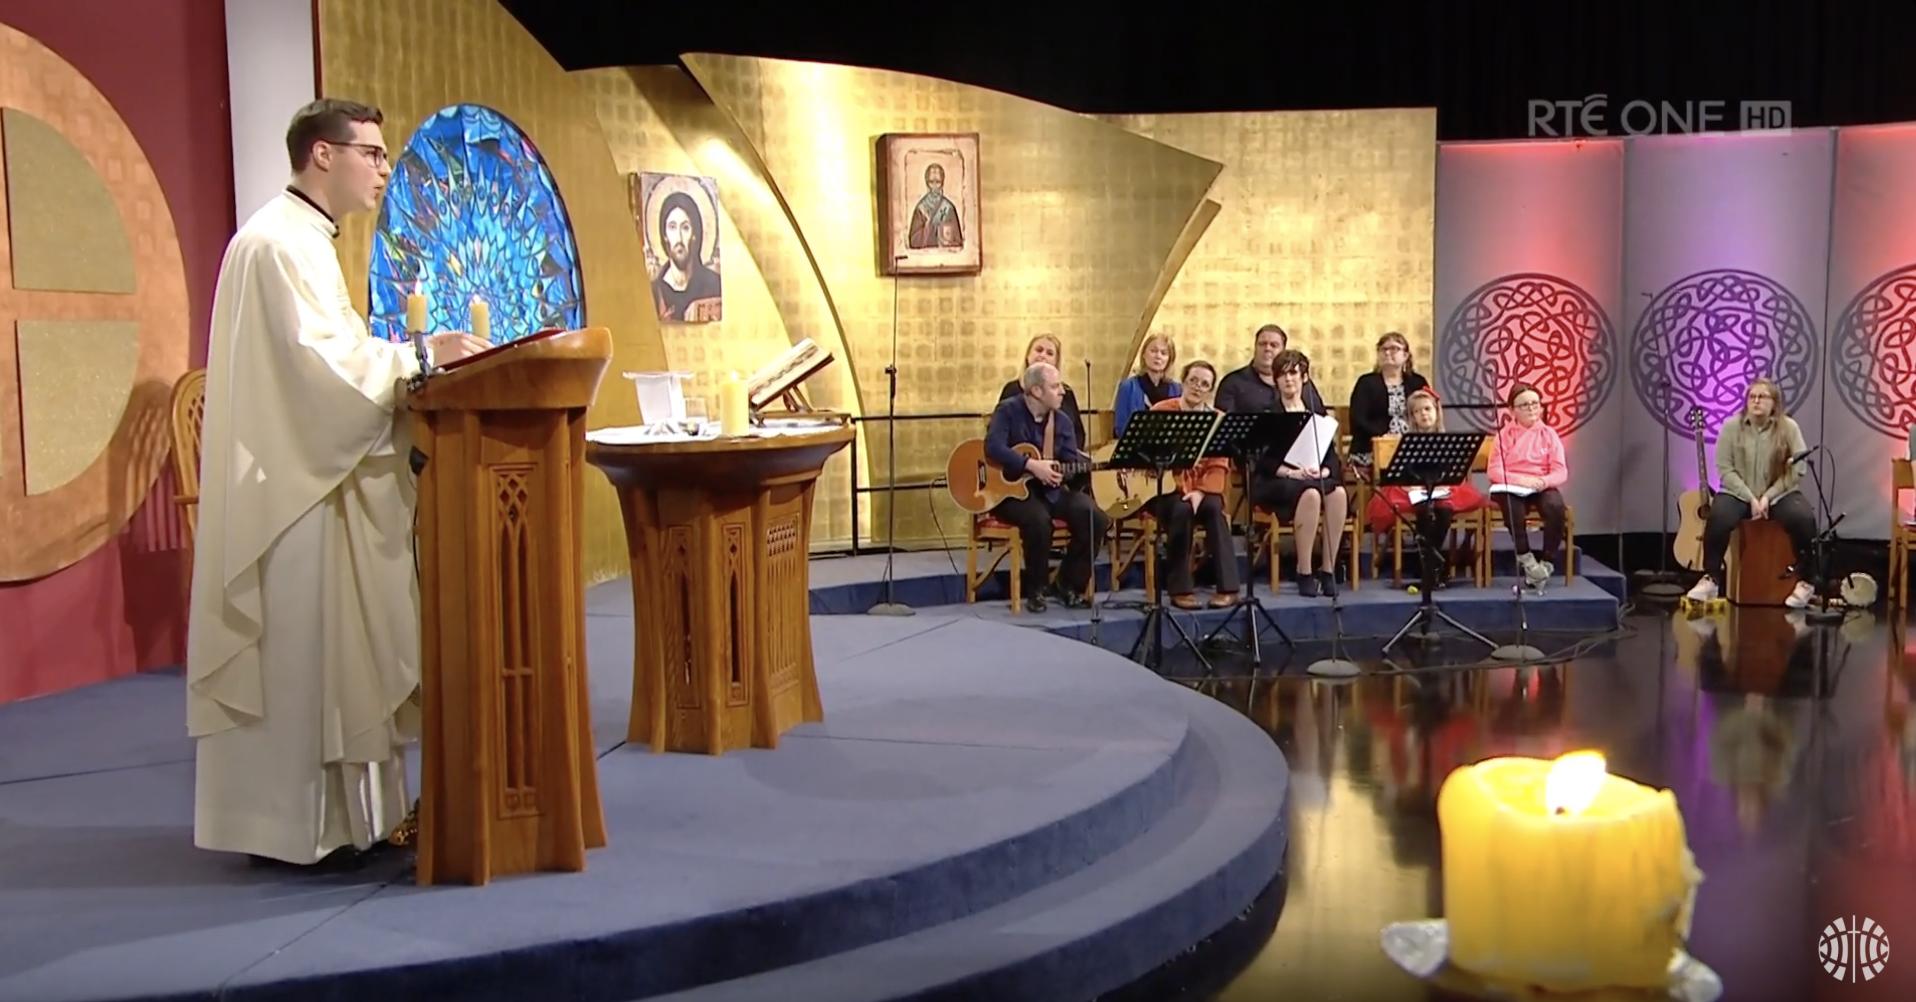 Bluebell parish mass RTE